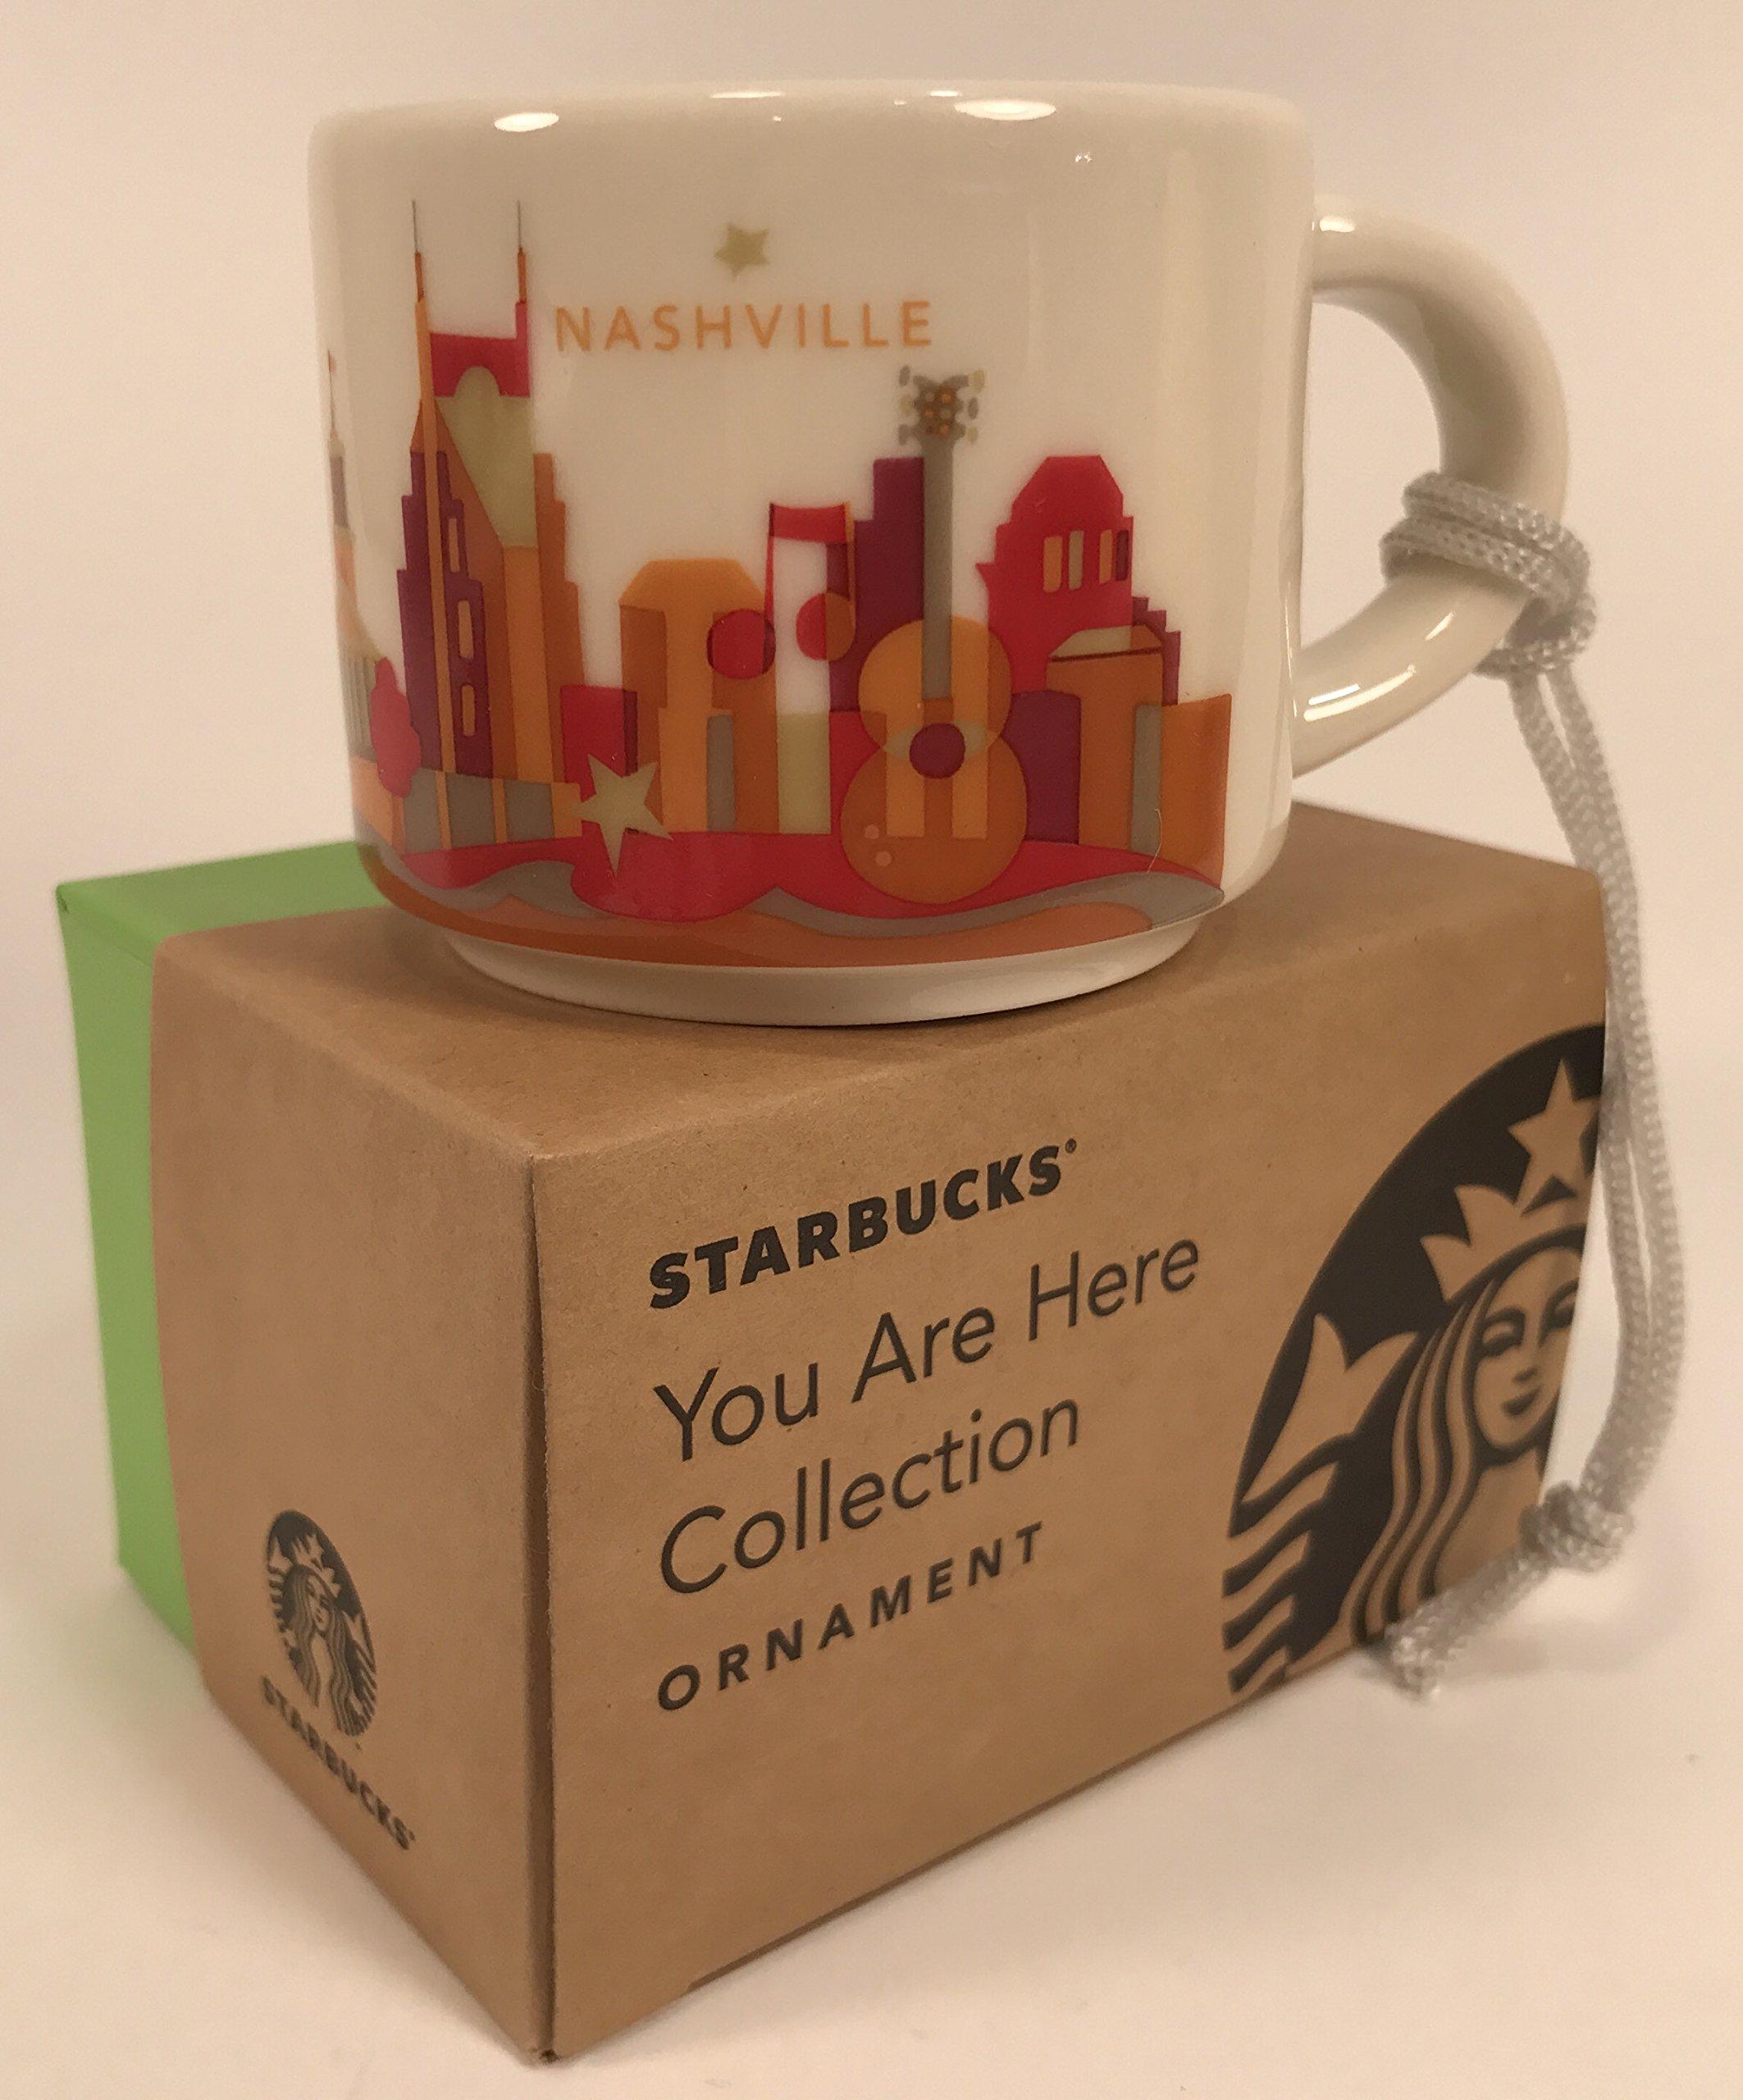 Starbucks Nashville You Are Here Collection Ceramic Coffee Mug Demitasse Ornament 2 oz